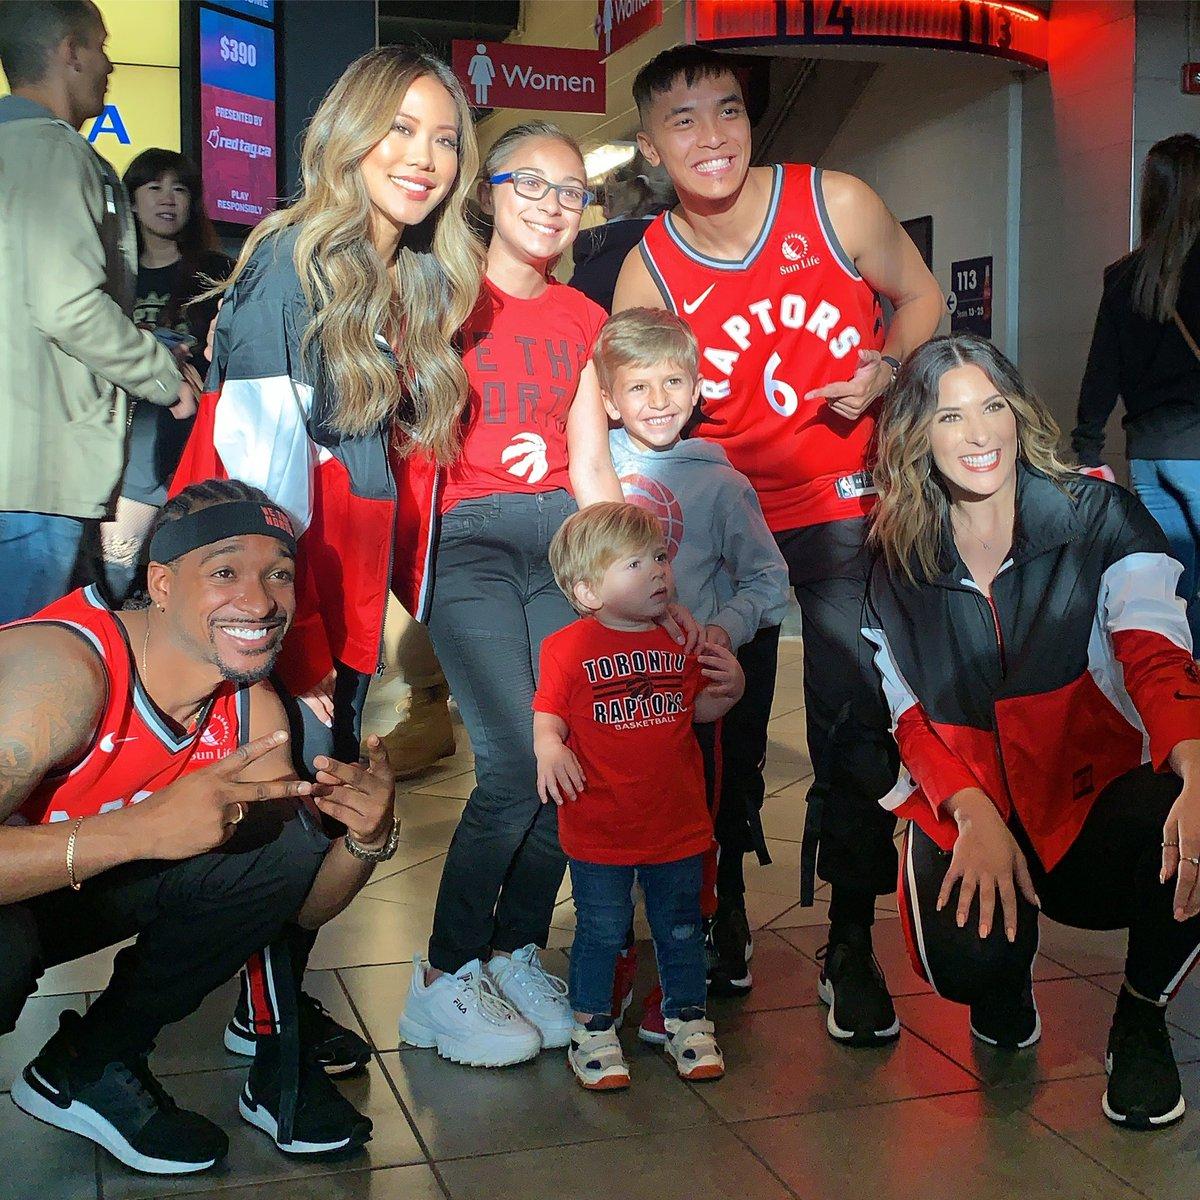 All smiles for GAME DAY 😁#Raptors vs #Pistons @ 7:30pm!! & S/O to our amazing sponsors Tan on the Run, Hair Love Studio Inc, @ThroneBarbers! #wethenorth #wethechamps #nba #nbadancers #toronto #basketball #northsidecrew